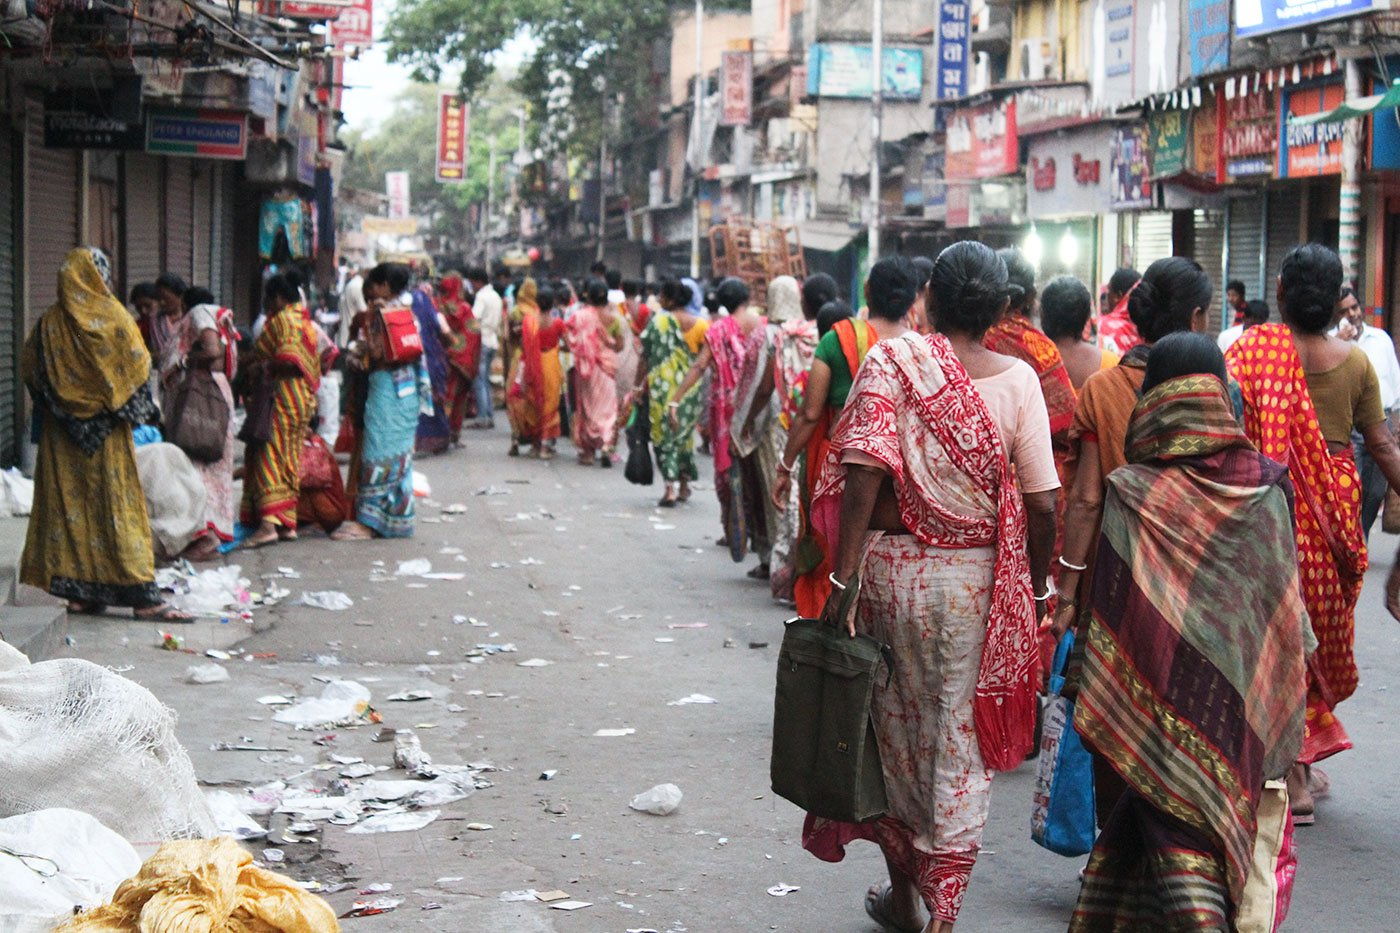 Workers outside Jadavpur railway station